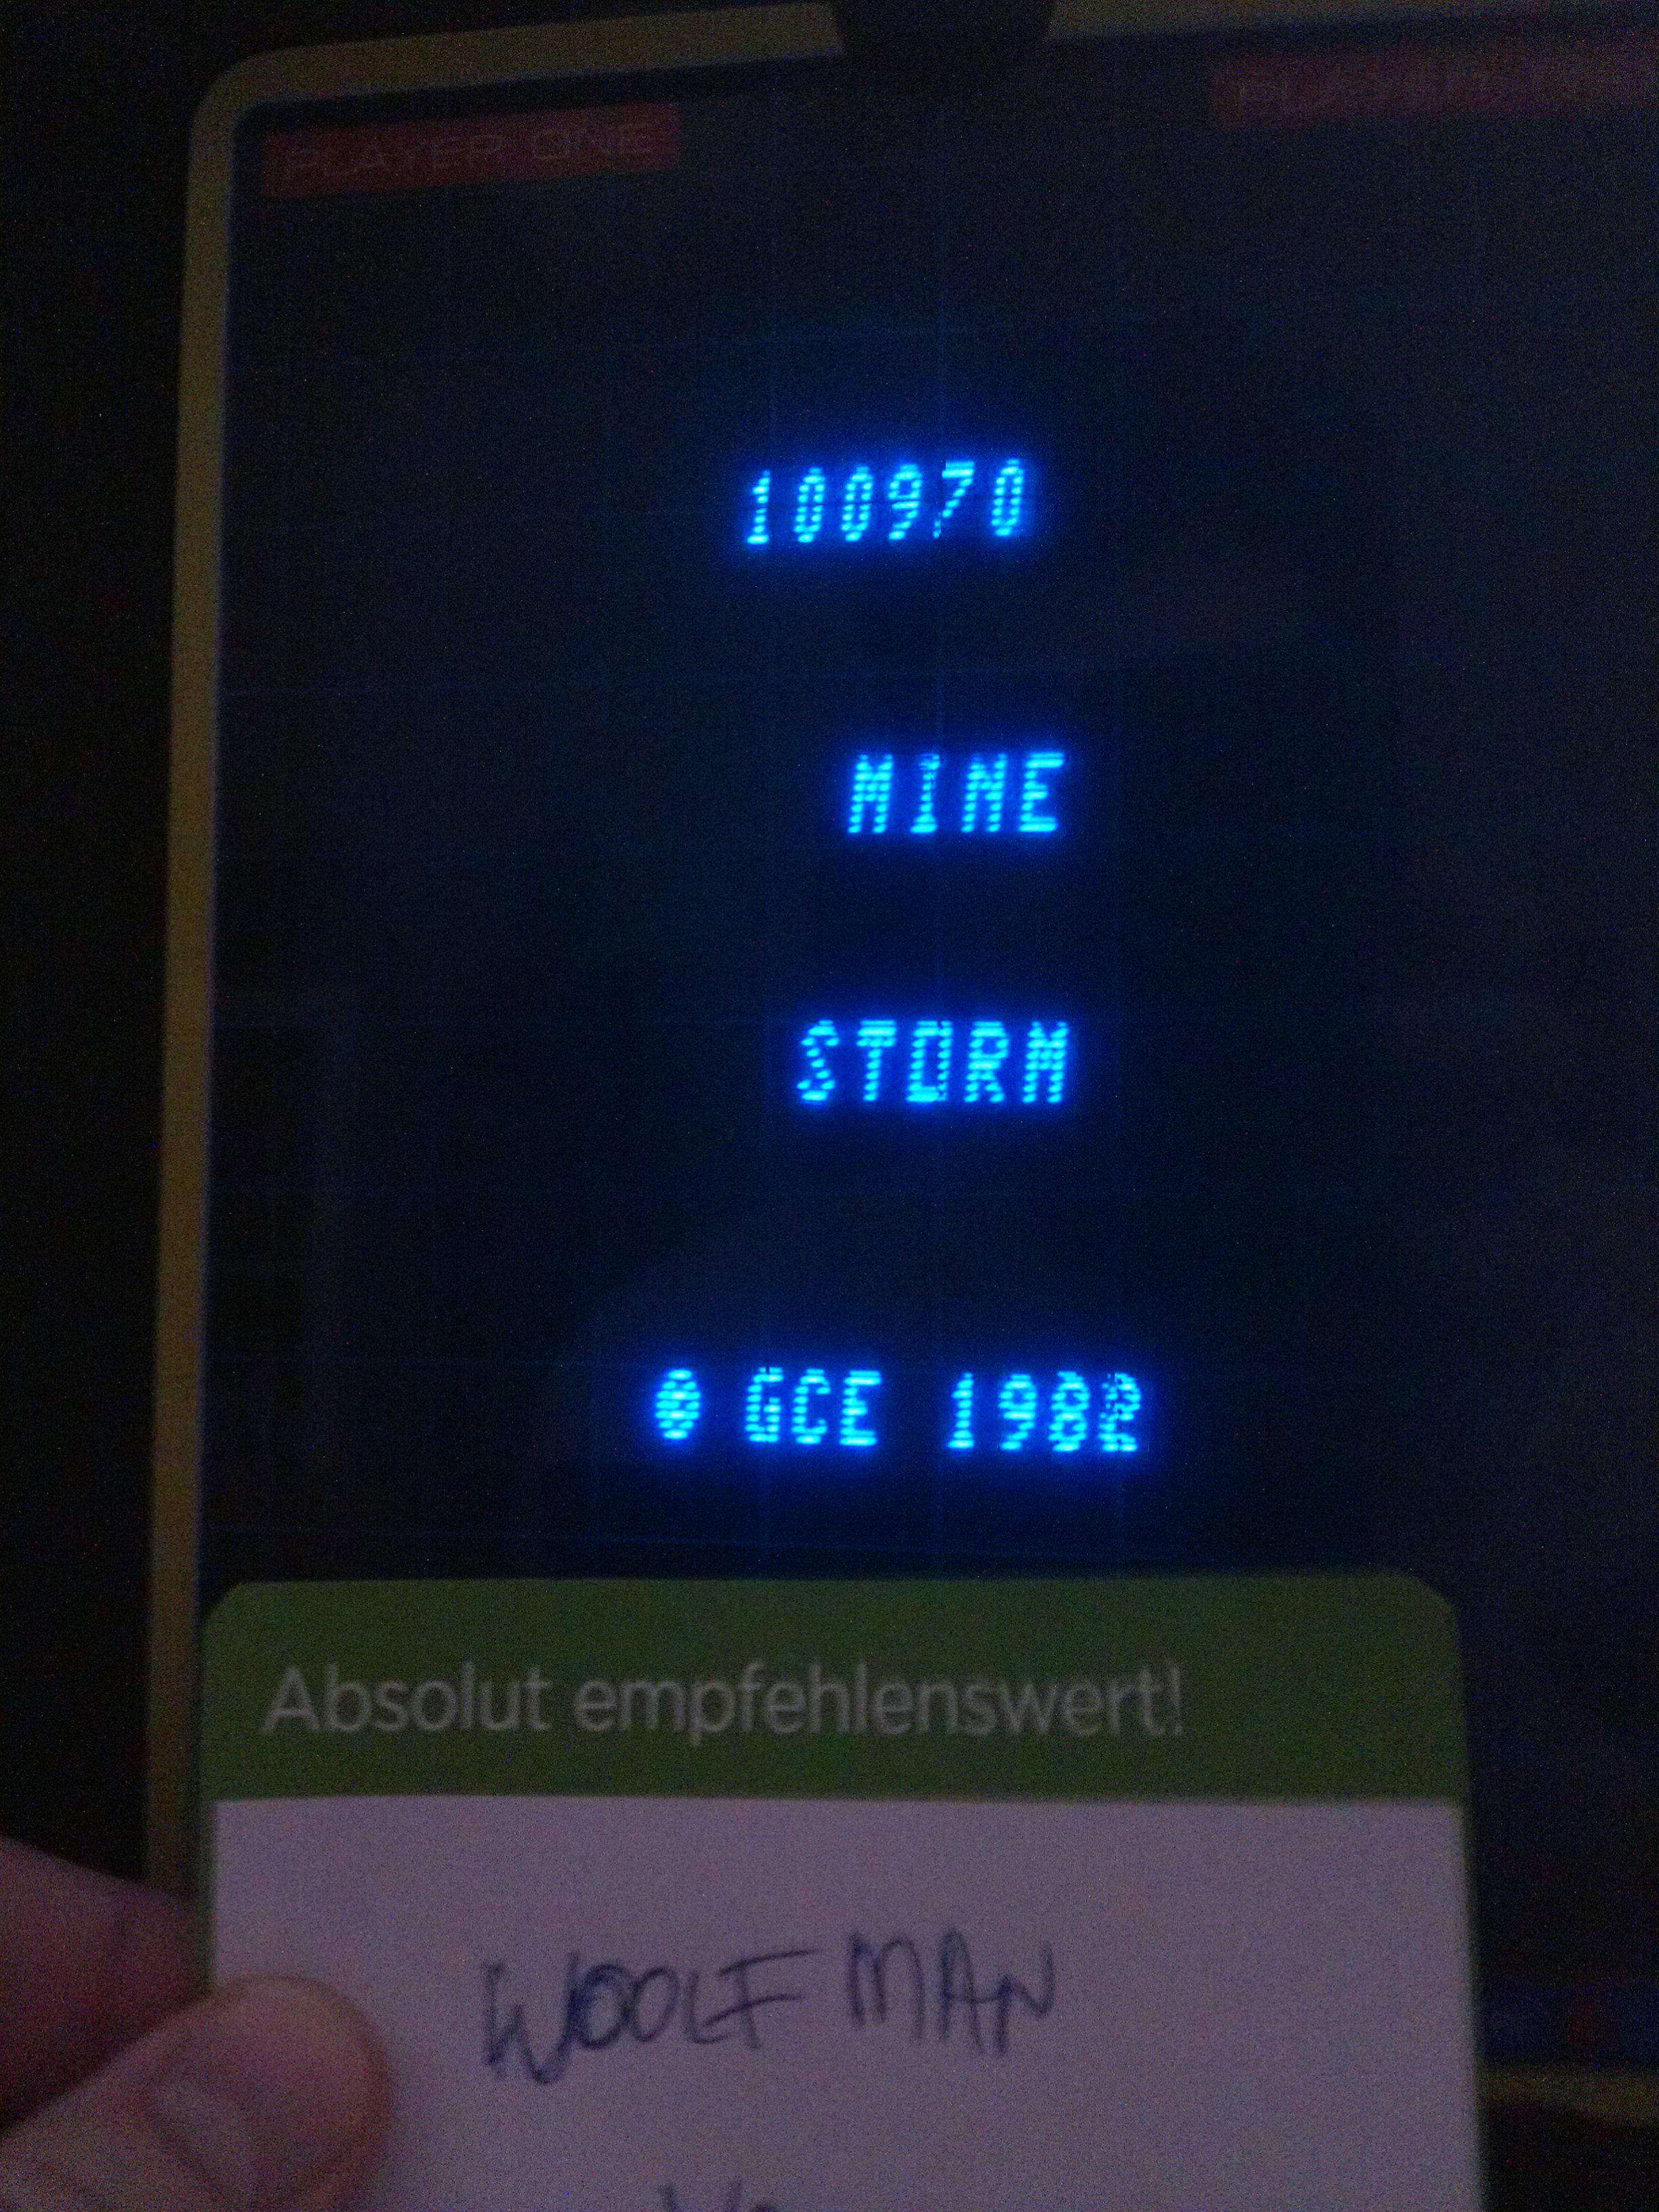 woolfman: Mine Storm: European version (Vectrex) 100,970 points on 2014-07-22 12:07:20